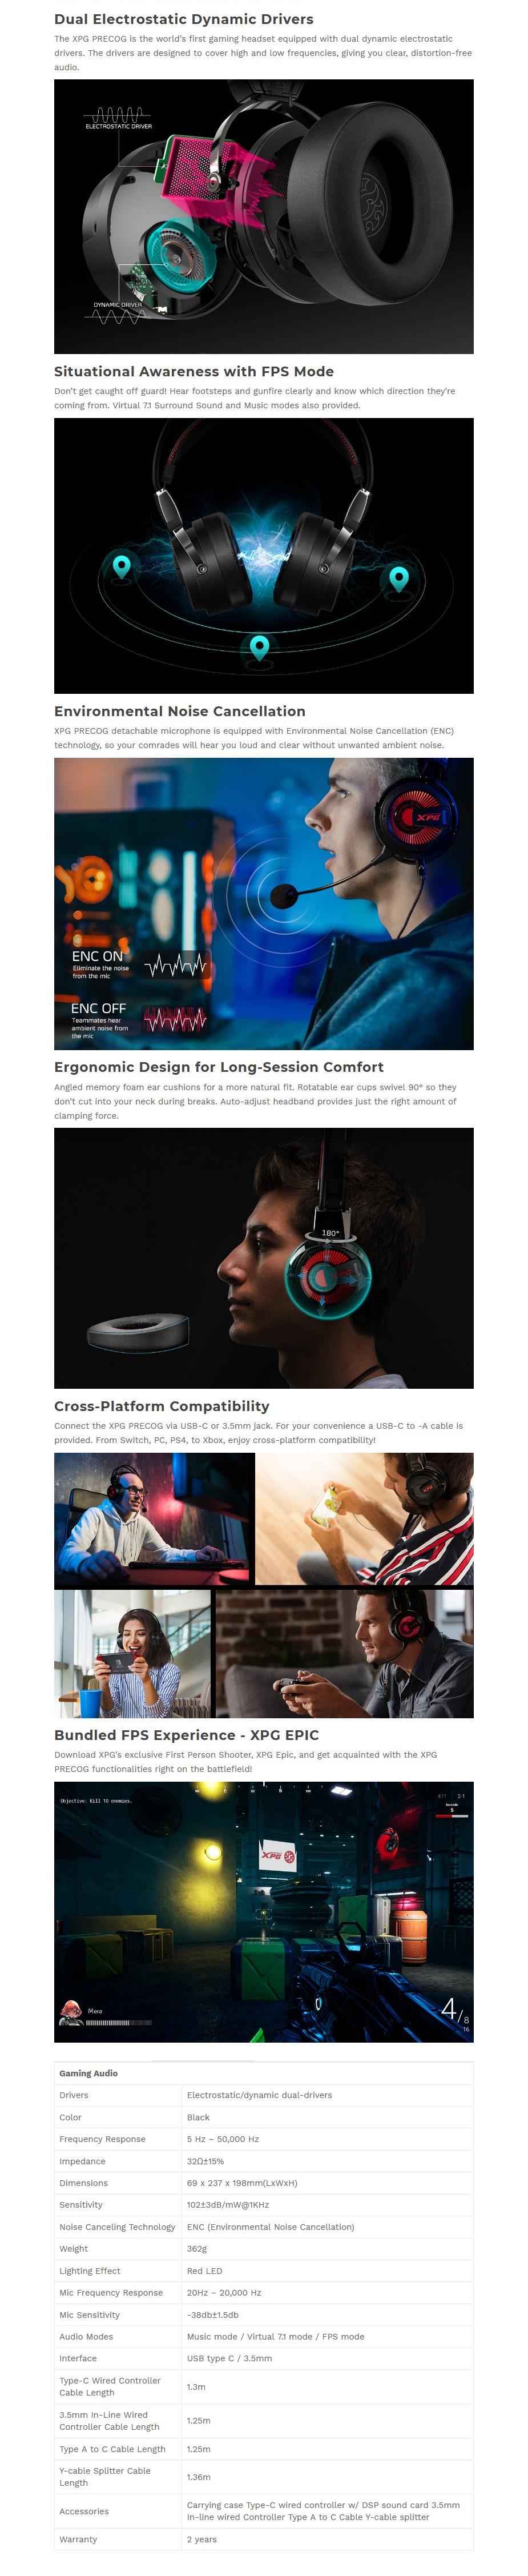 adata_precog_virtual_71_surround_sound_gaming_headset_ac39385_2.jpg